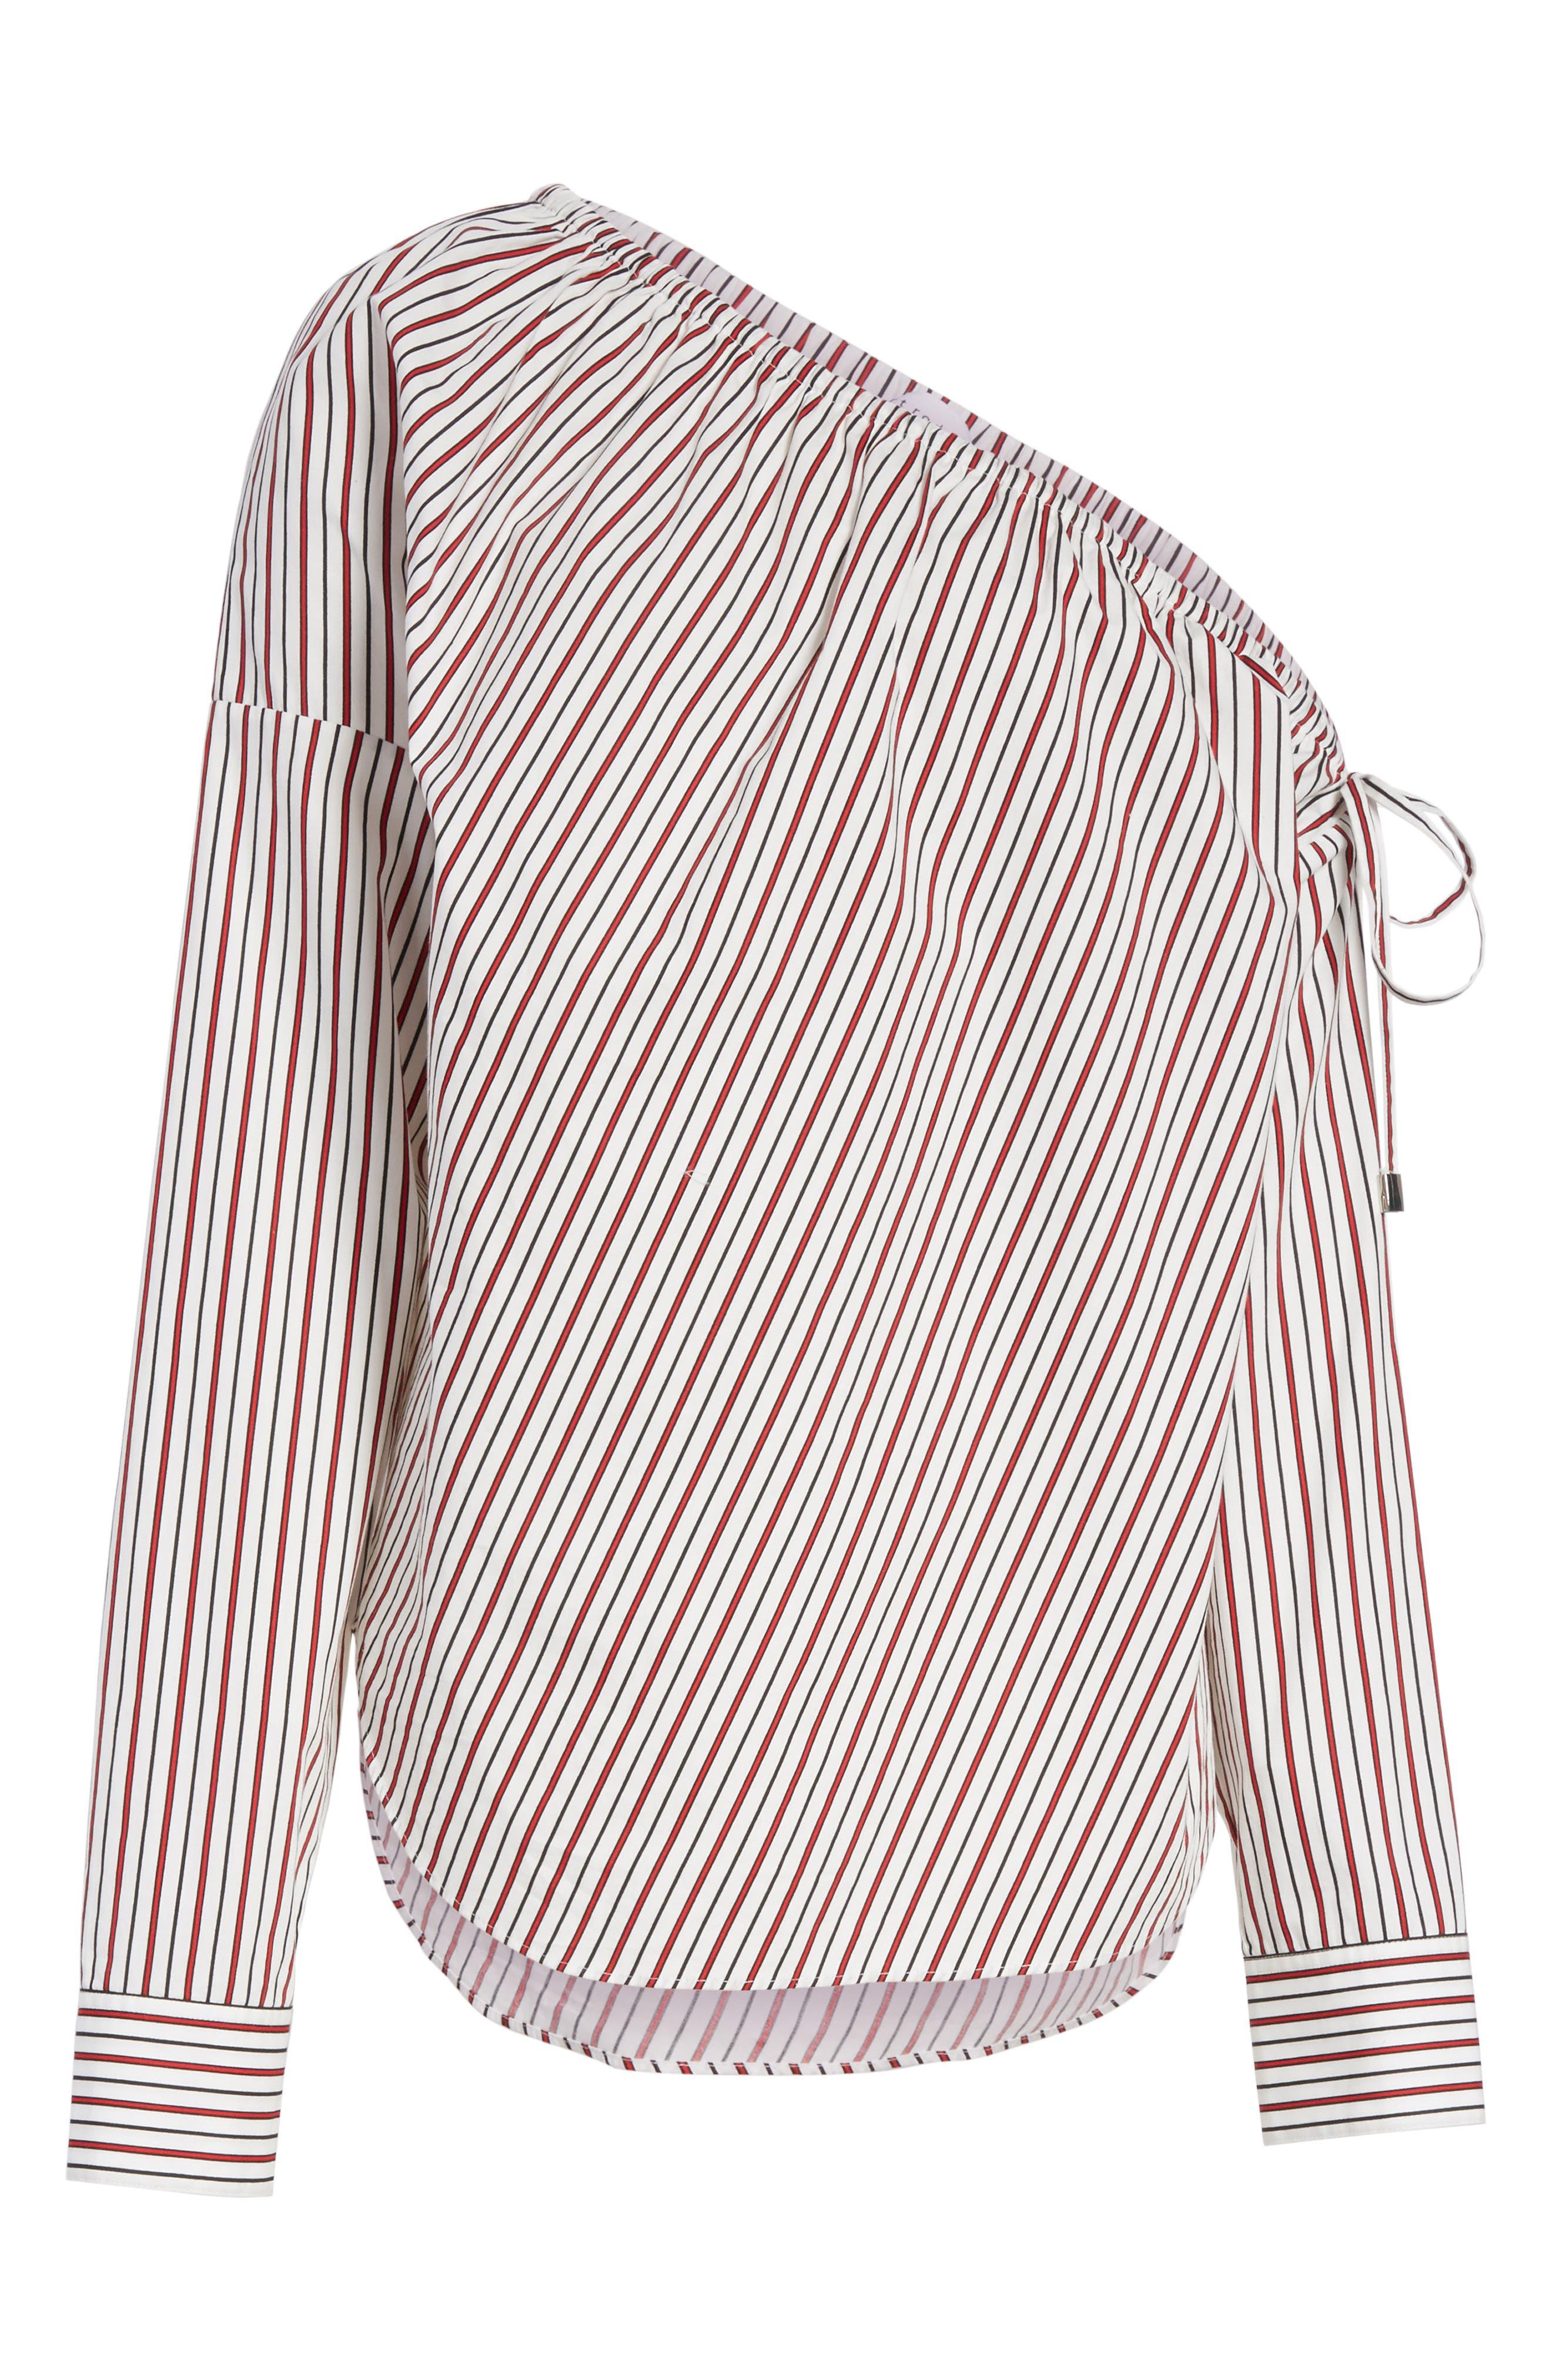 Cinched One-Shoulder Top,                             Alternate thumbnail 6, color,                             Red Stripe